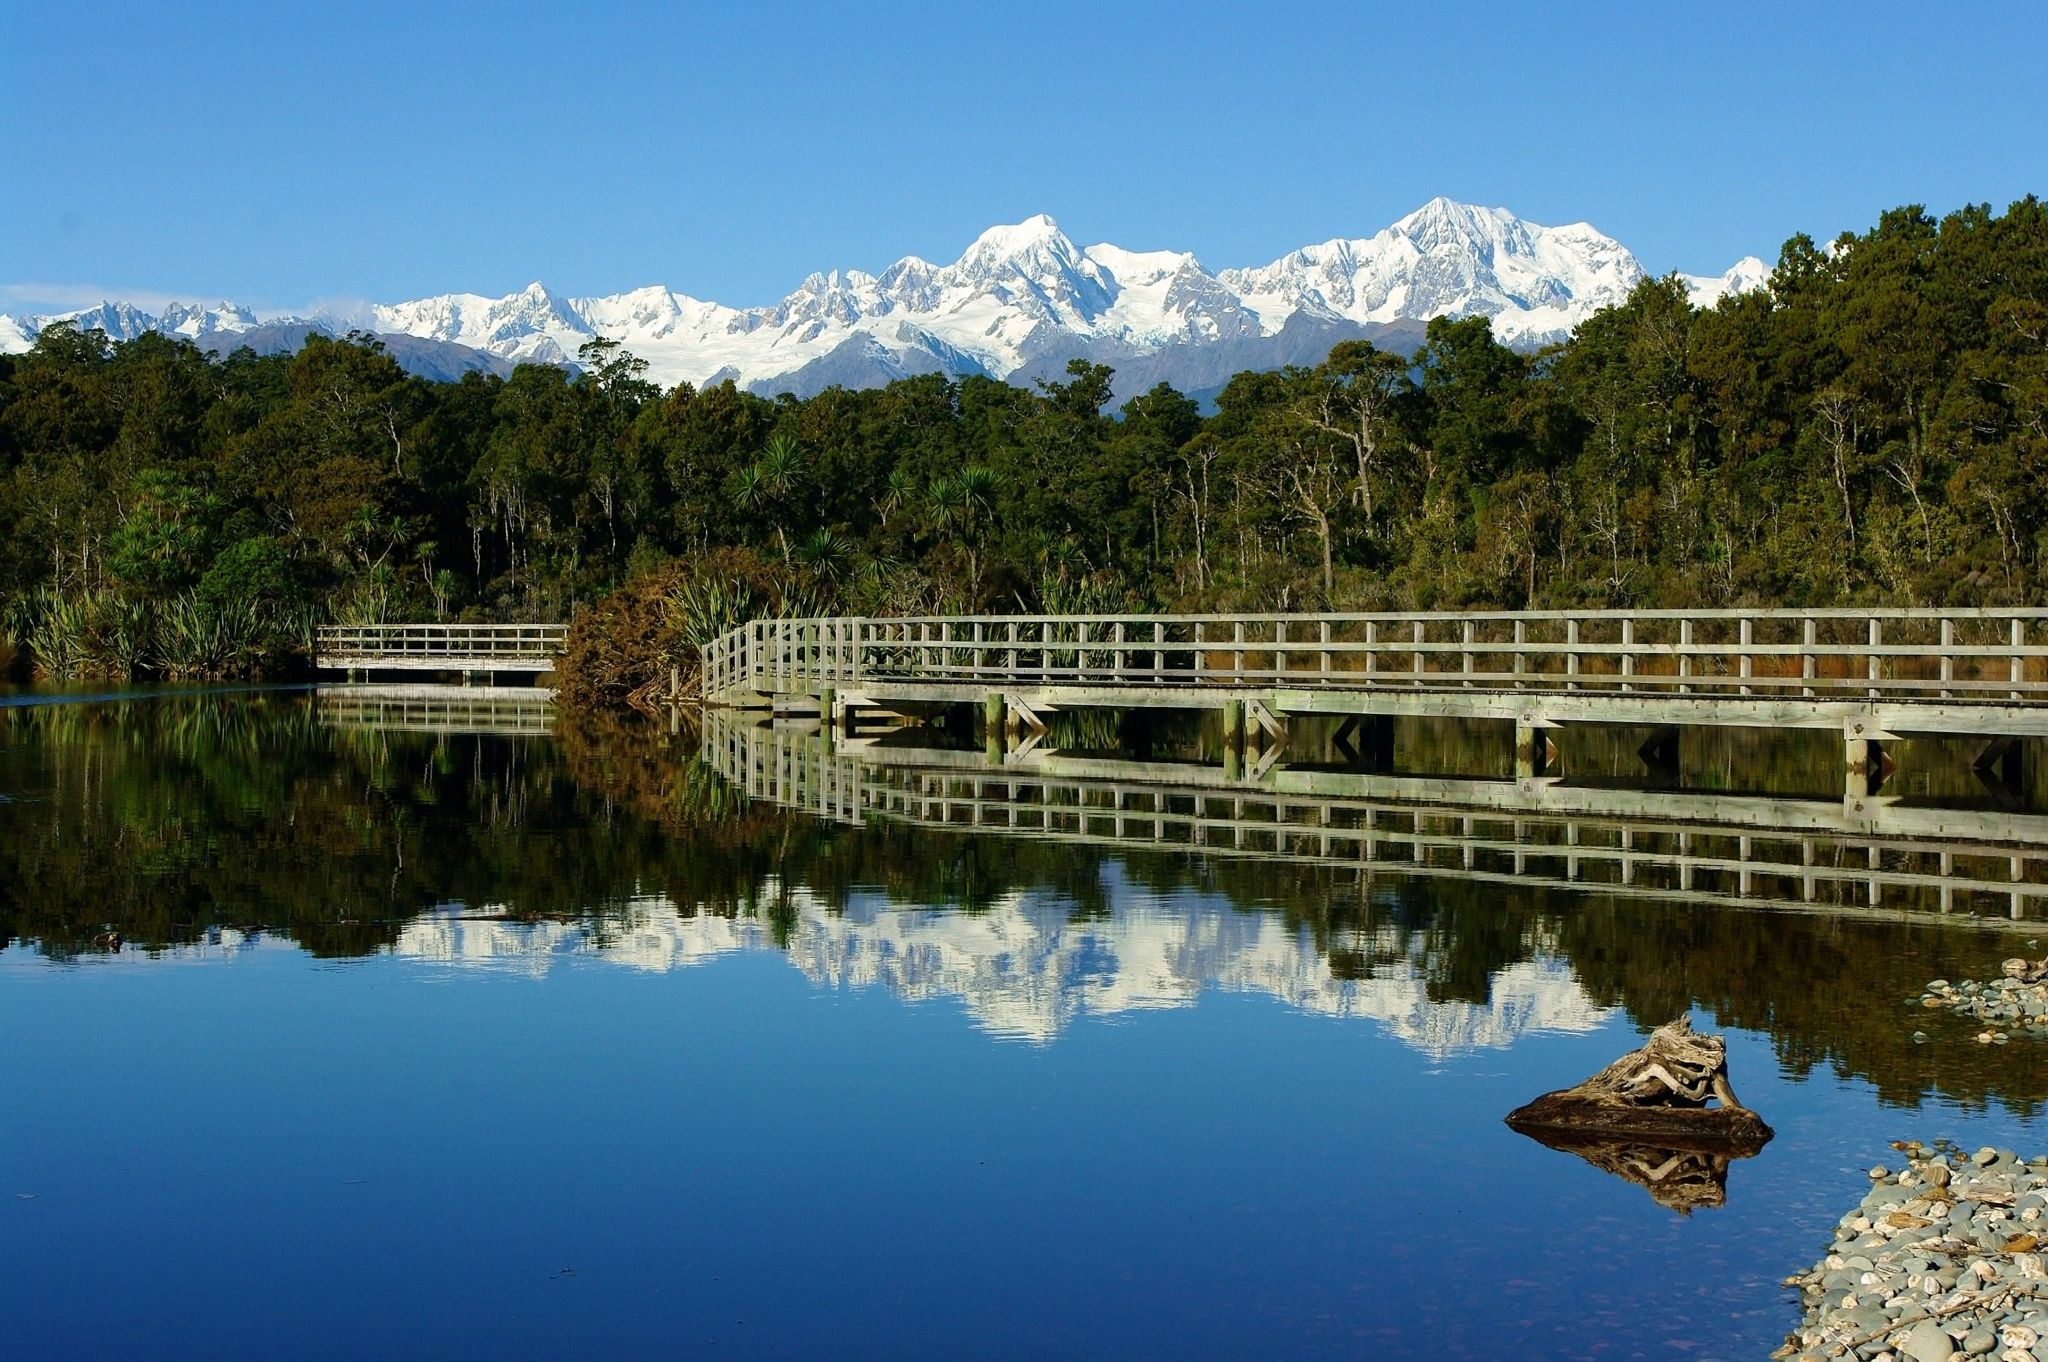 gillespies lagoon, New Zealand